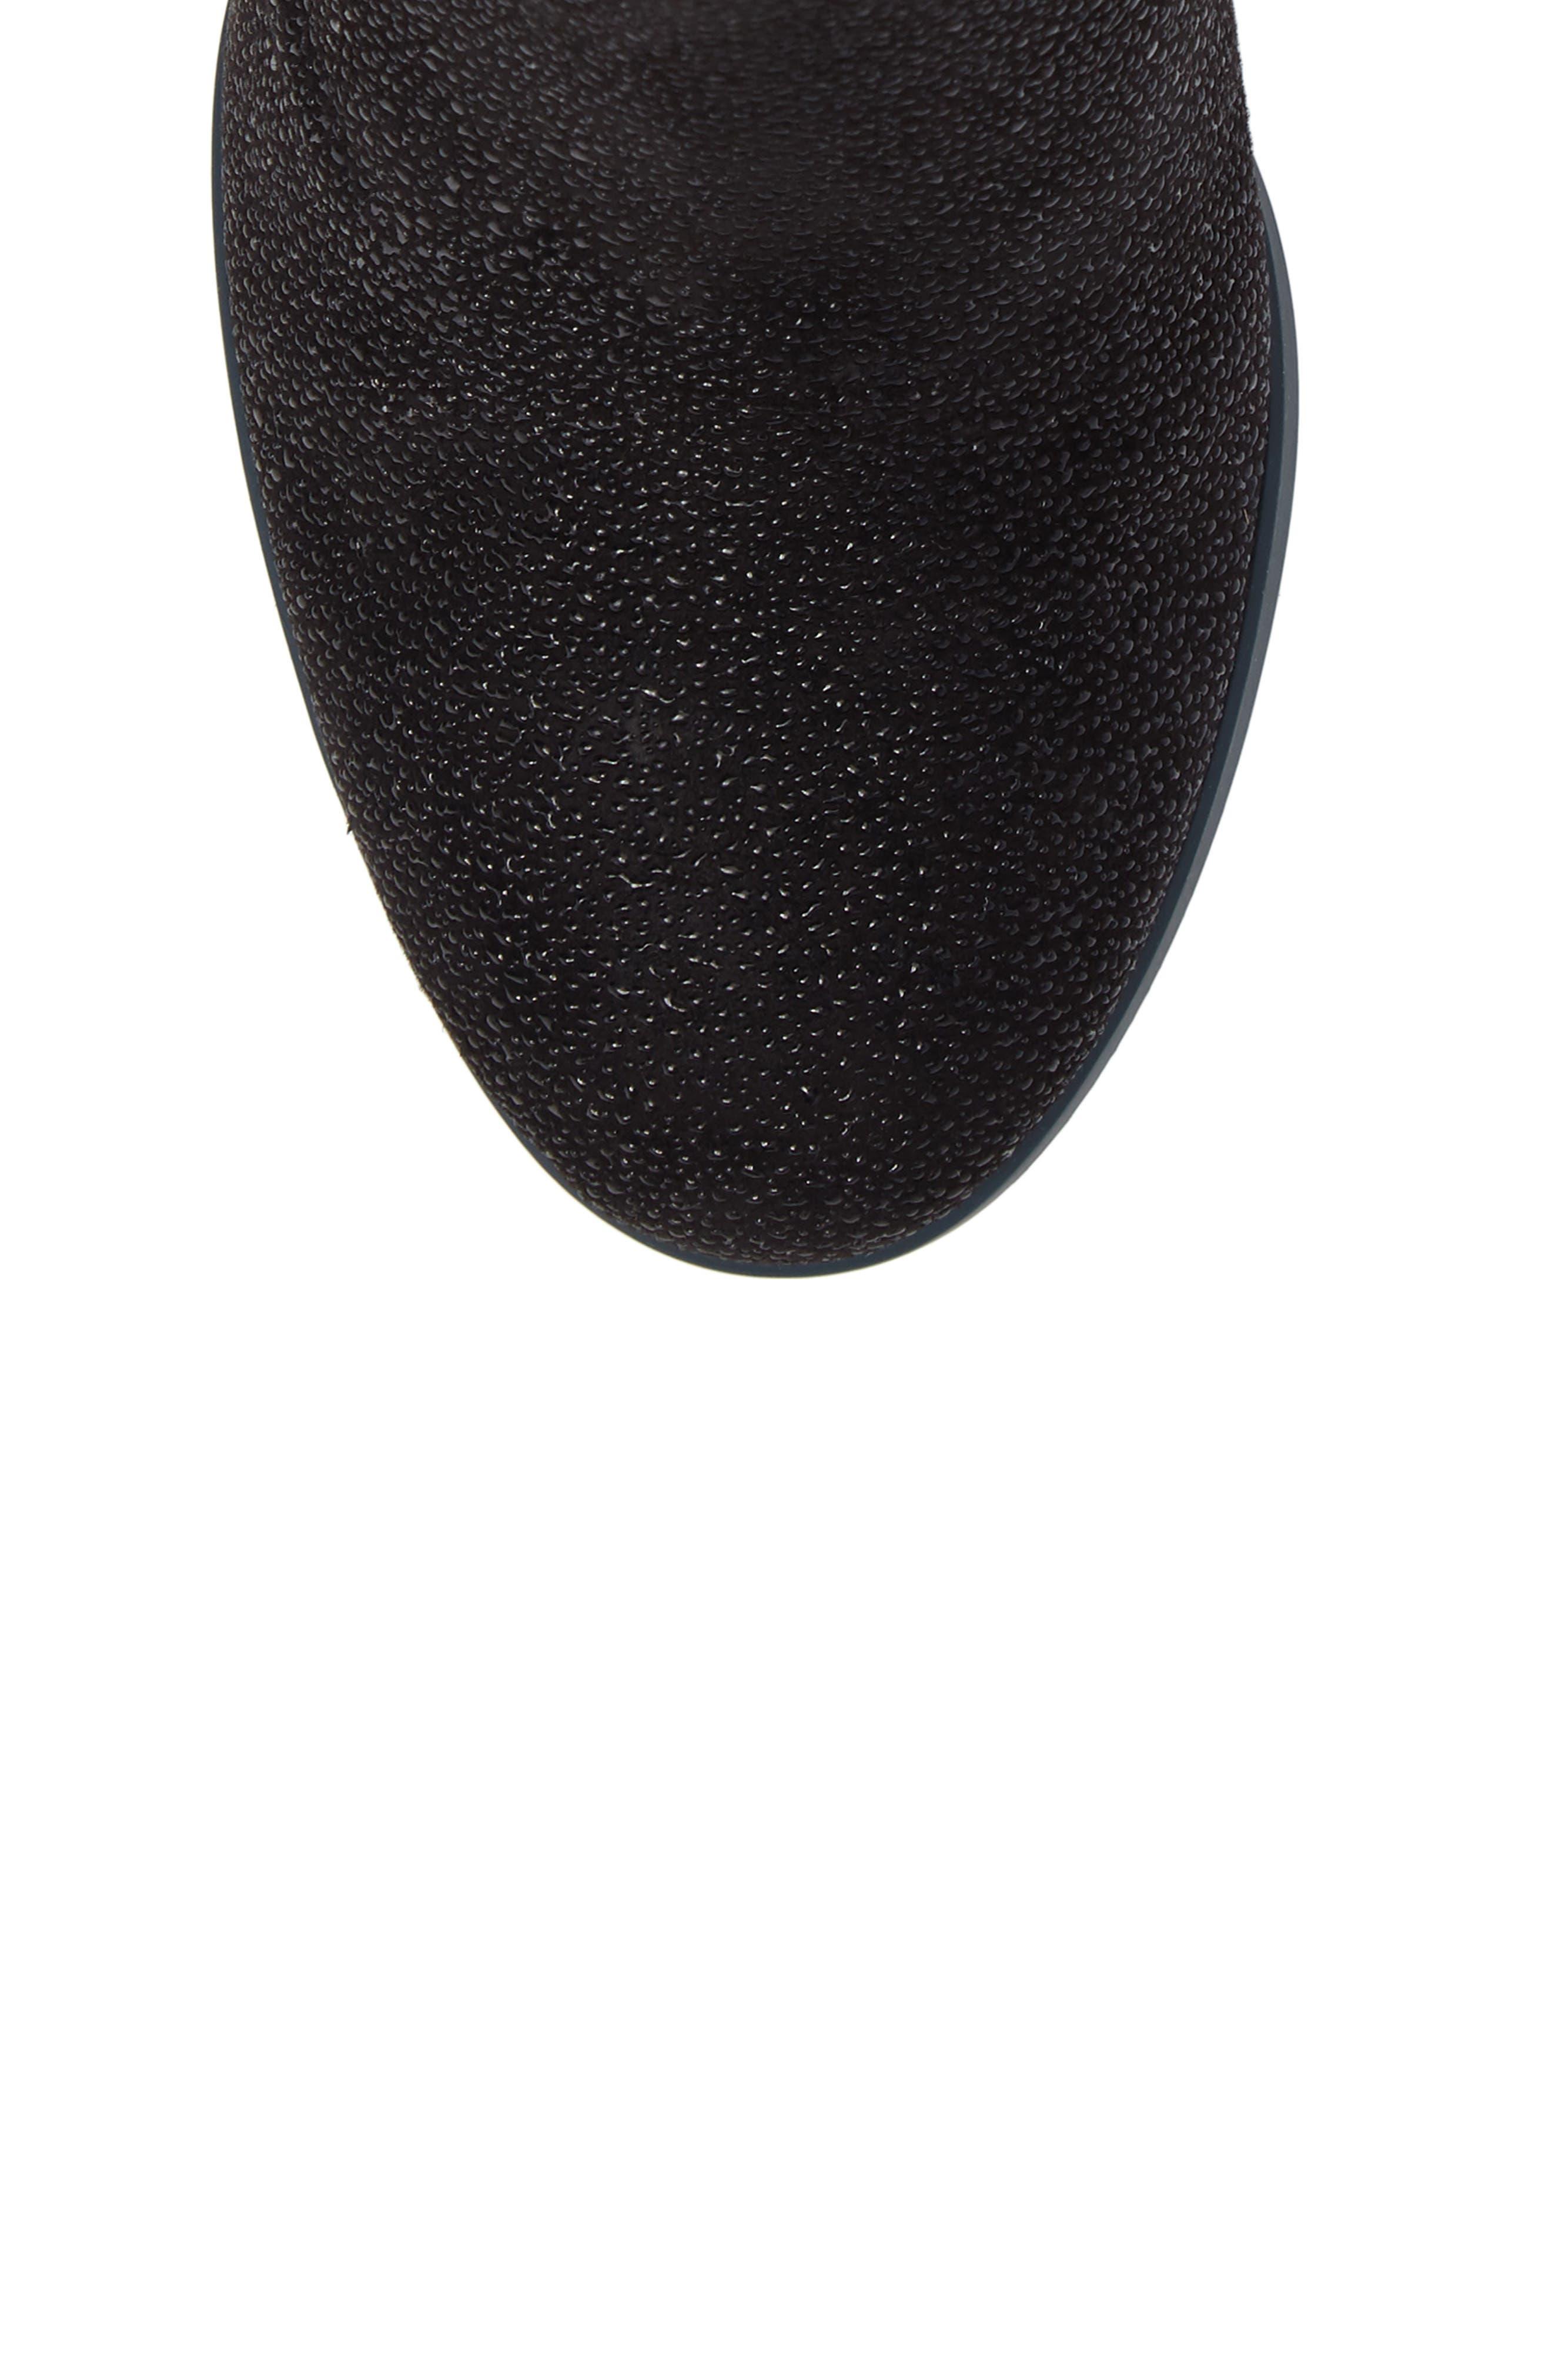 Kara Flared Heel Bootie,                             Alternate thumbnail 5, color,                             Black Sparkle Leather